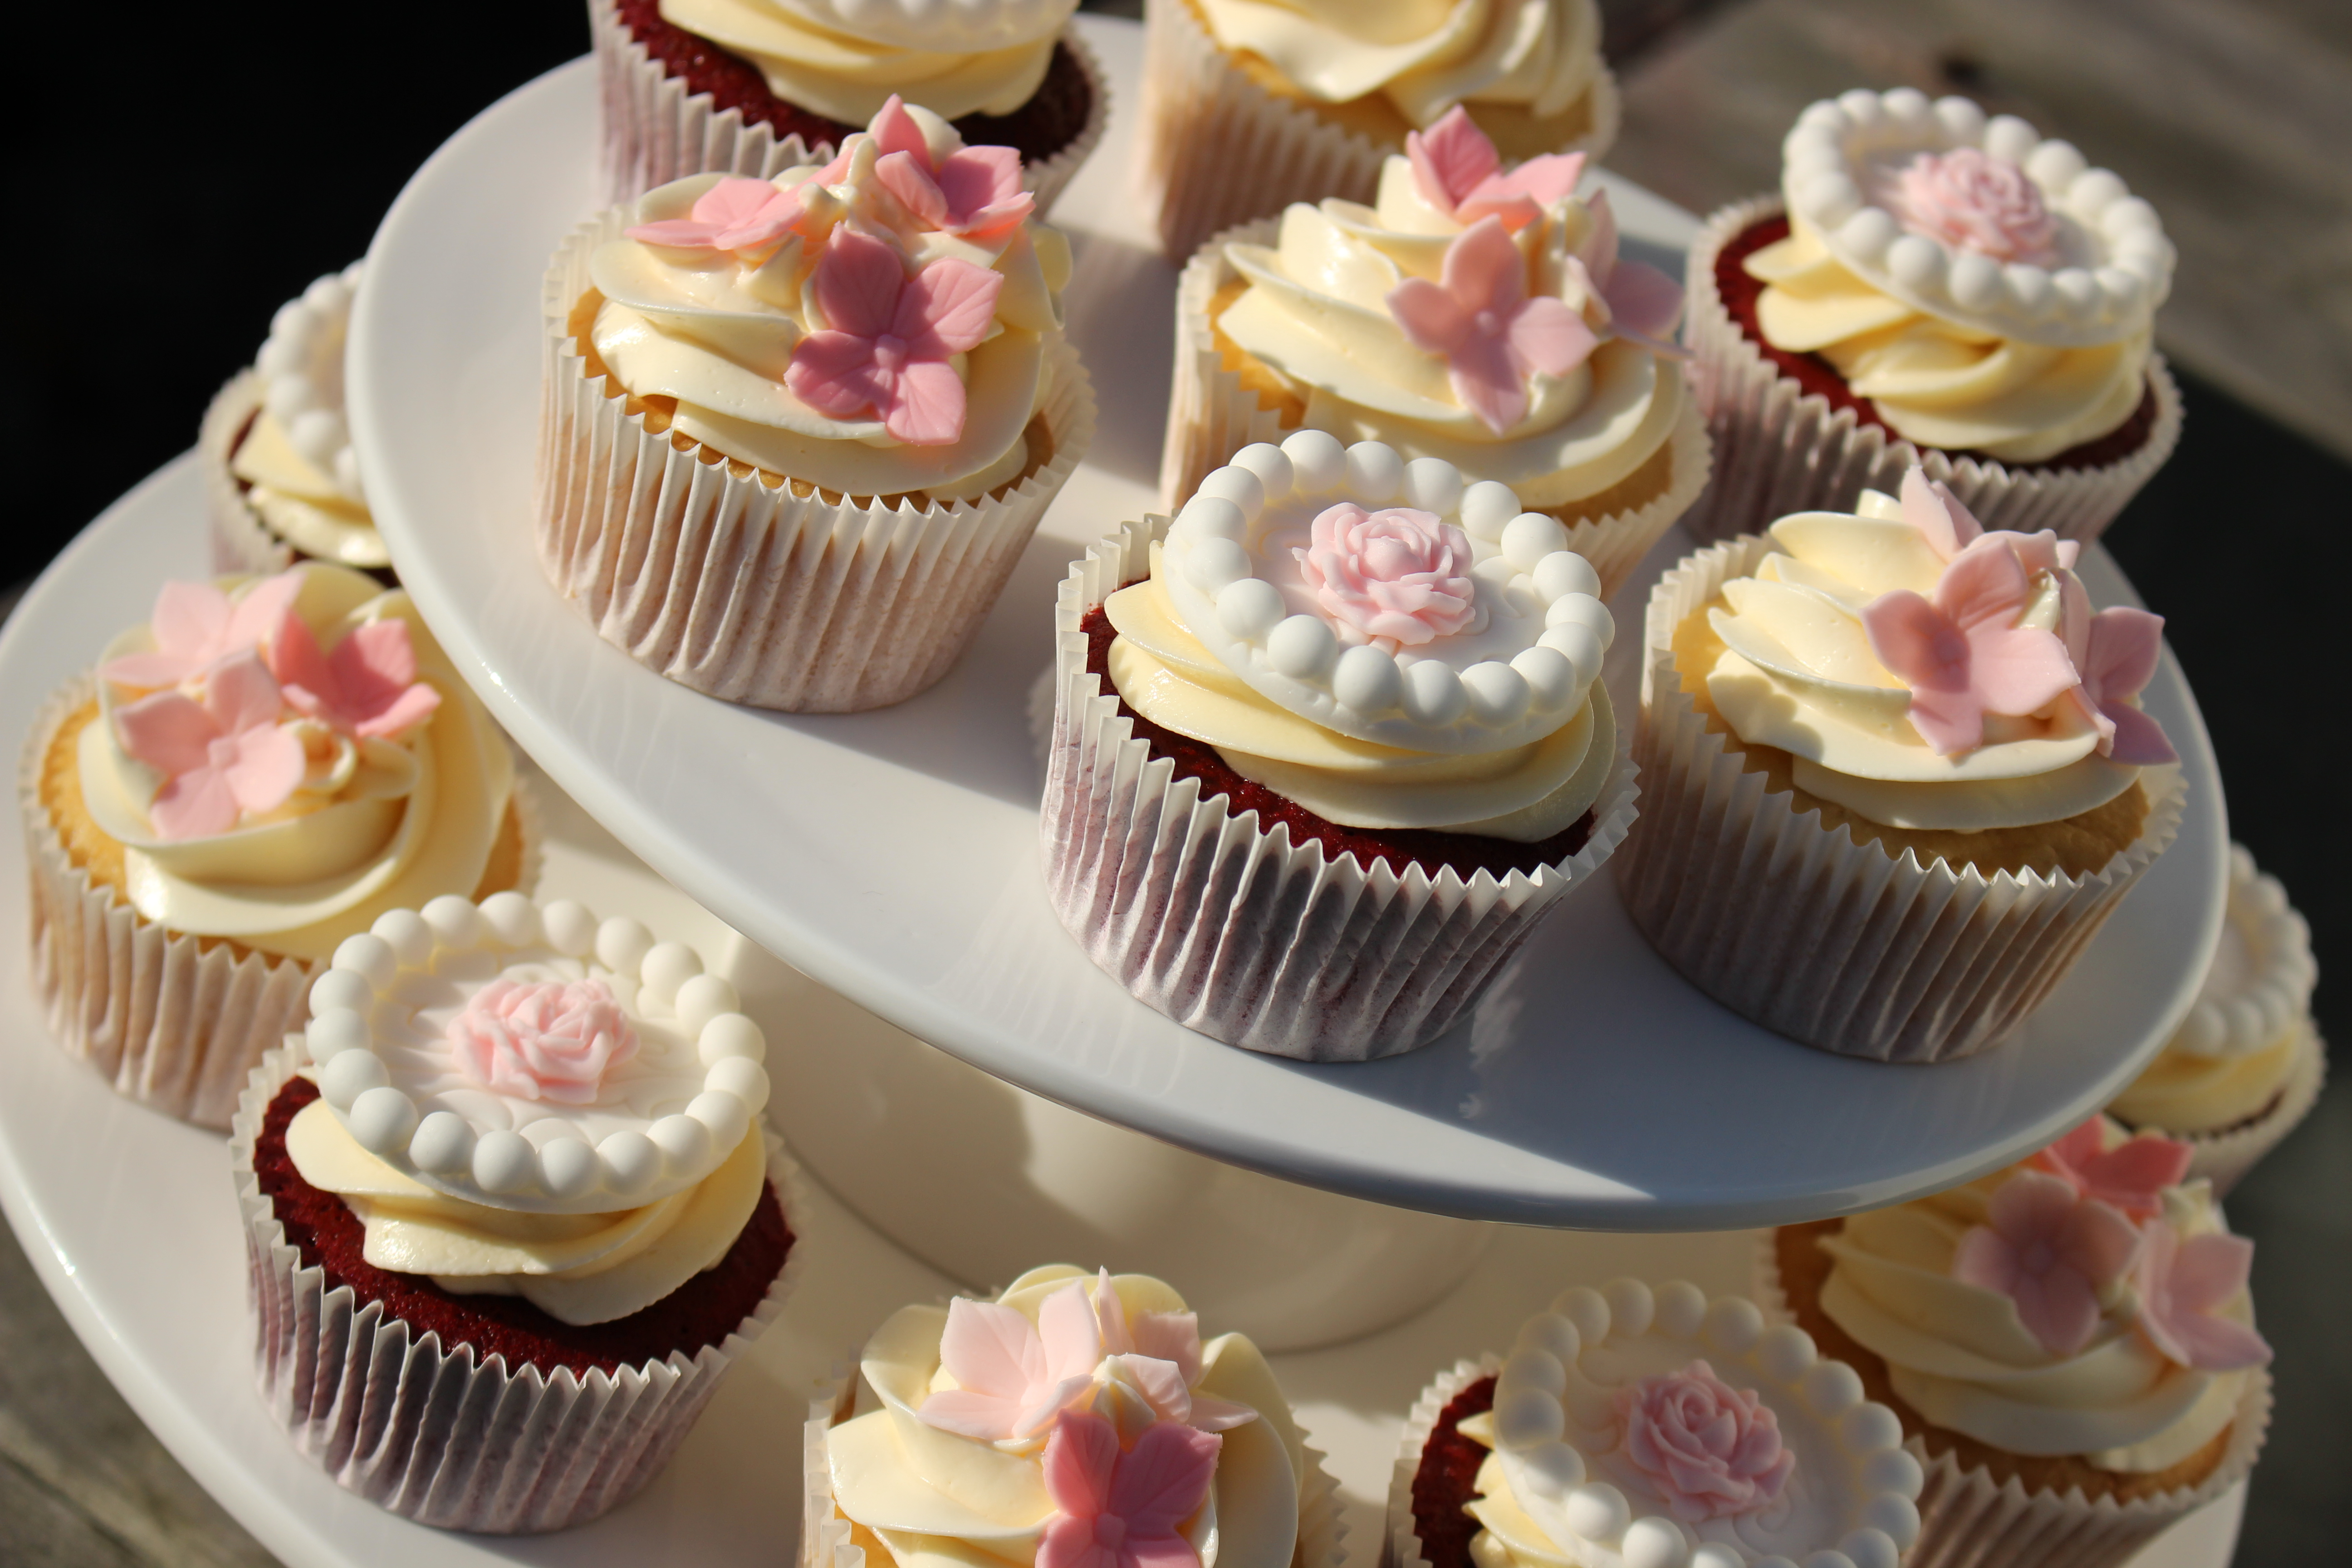 50-4-cupcakes